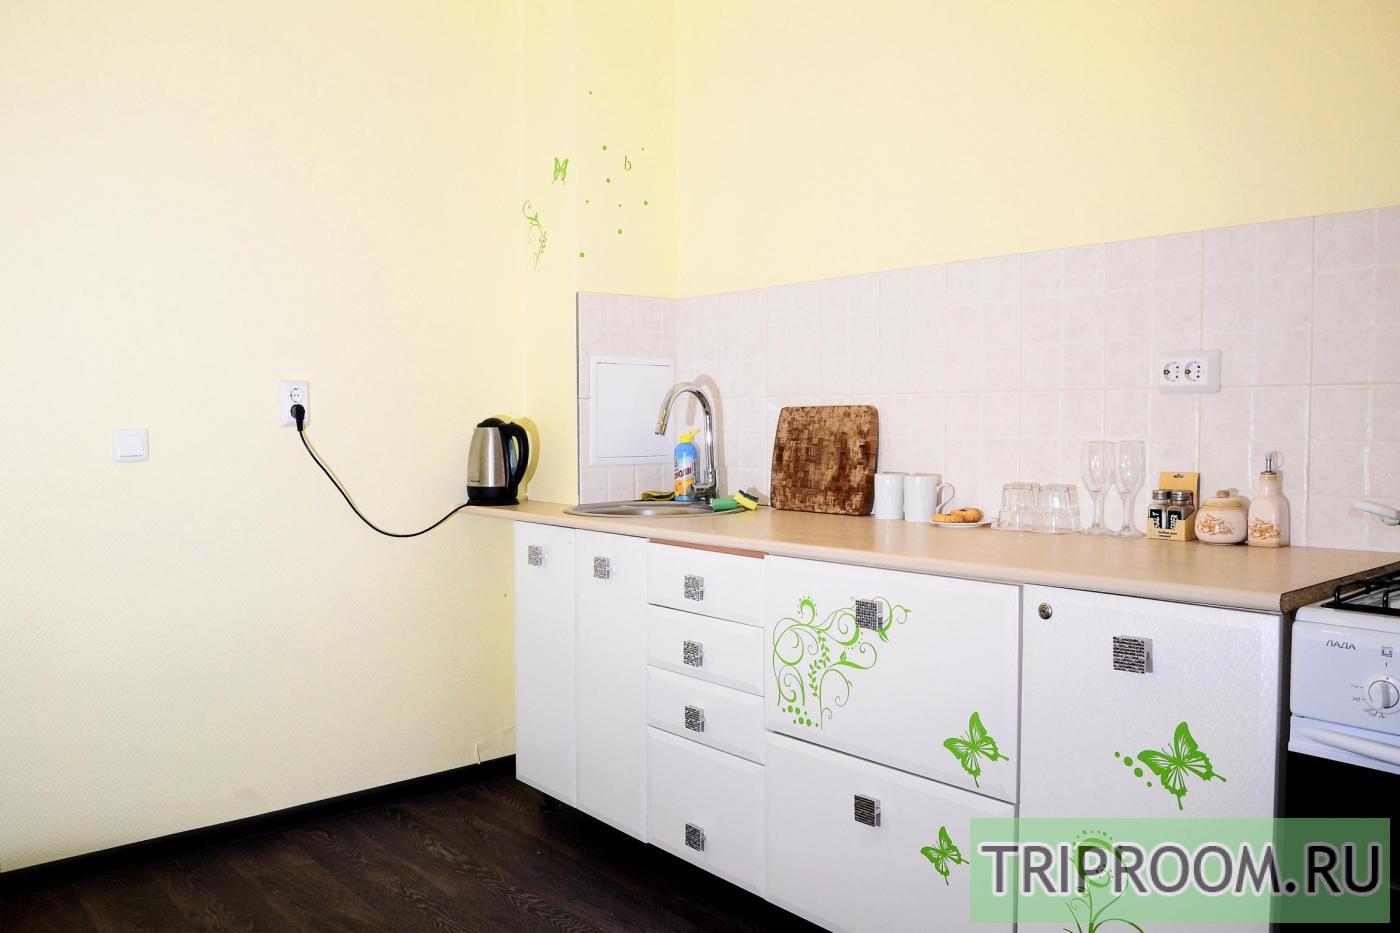 1-комнатная квартира посуточно (вариант № 14713), ул. Петра Смородина улица, фото № 19